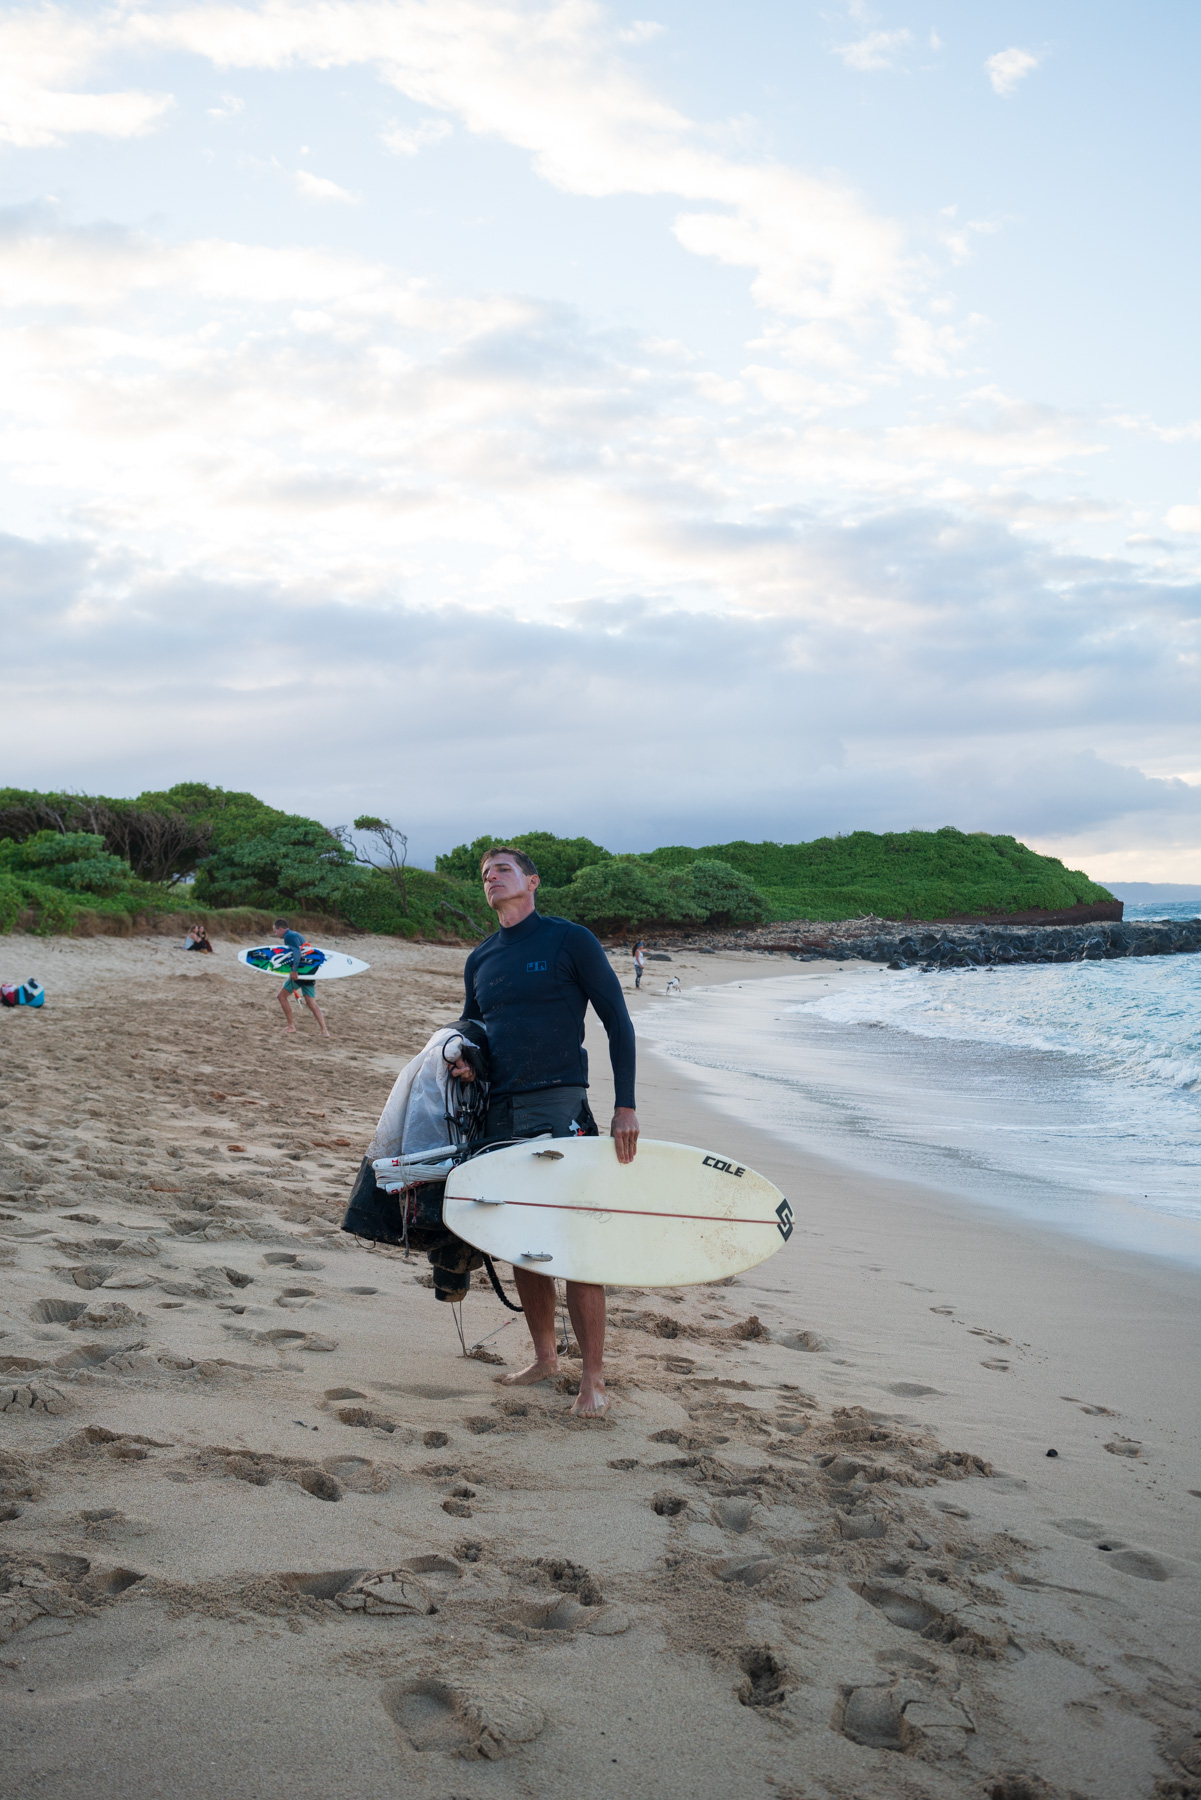 Maui-Trip-Kite-50.jpg